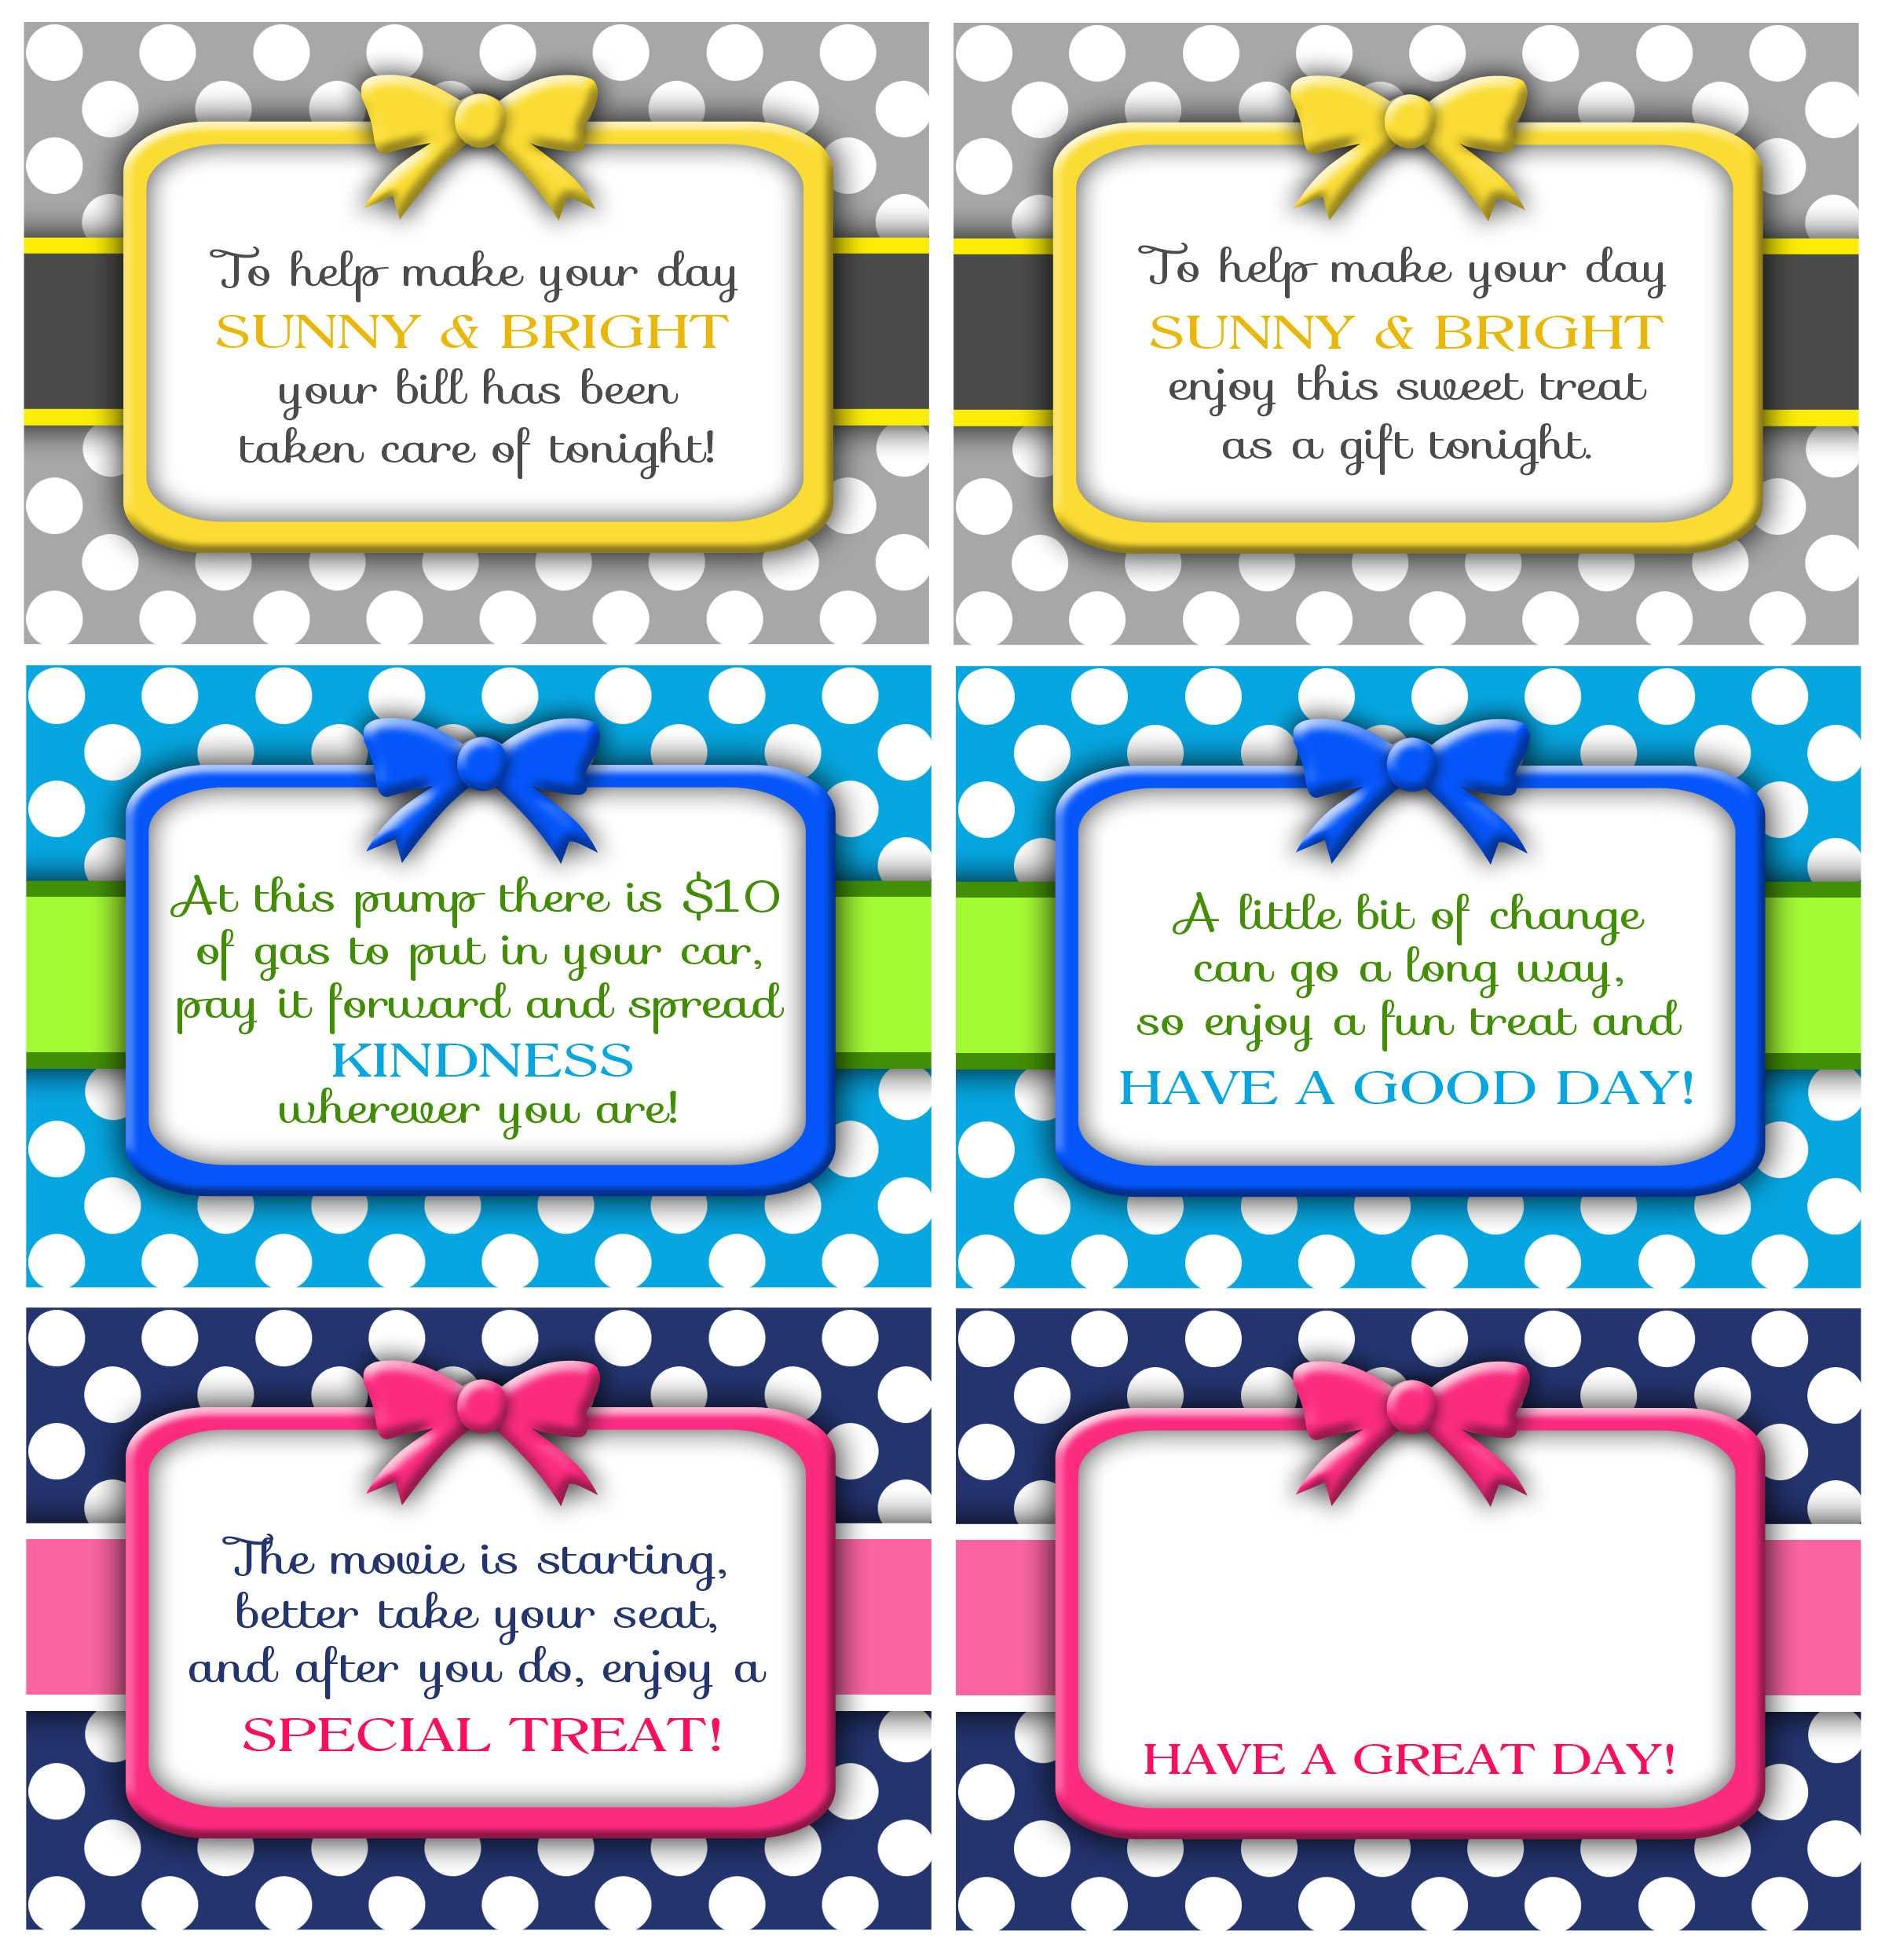 Random Acts Of Kindness Cards - Darling Doodles with Random Acts Of Kindness Cards Templates